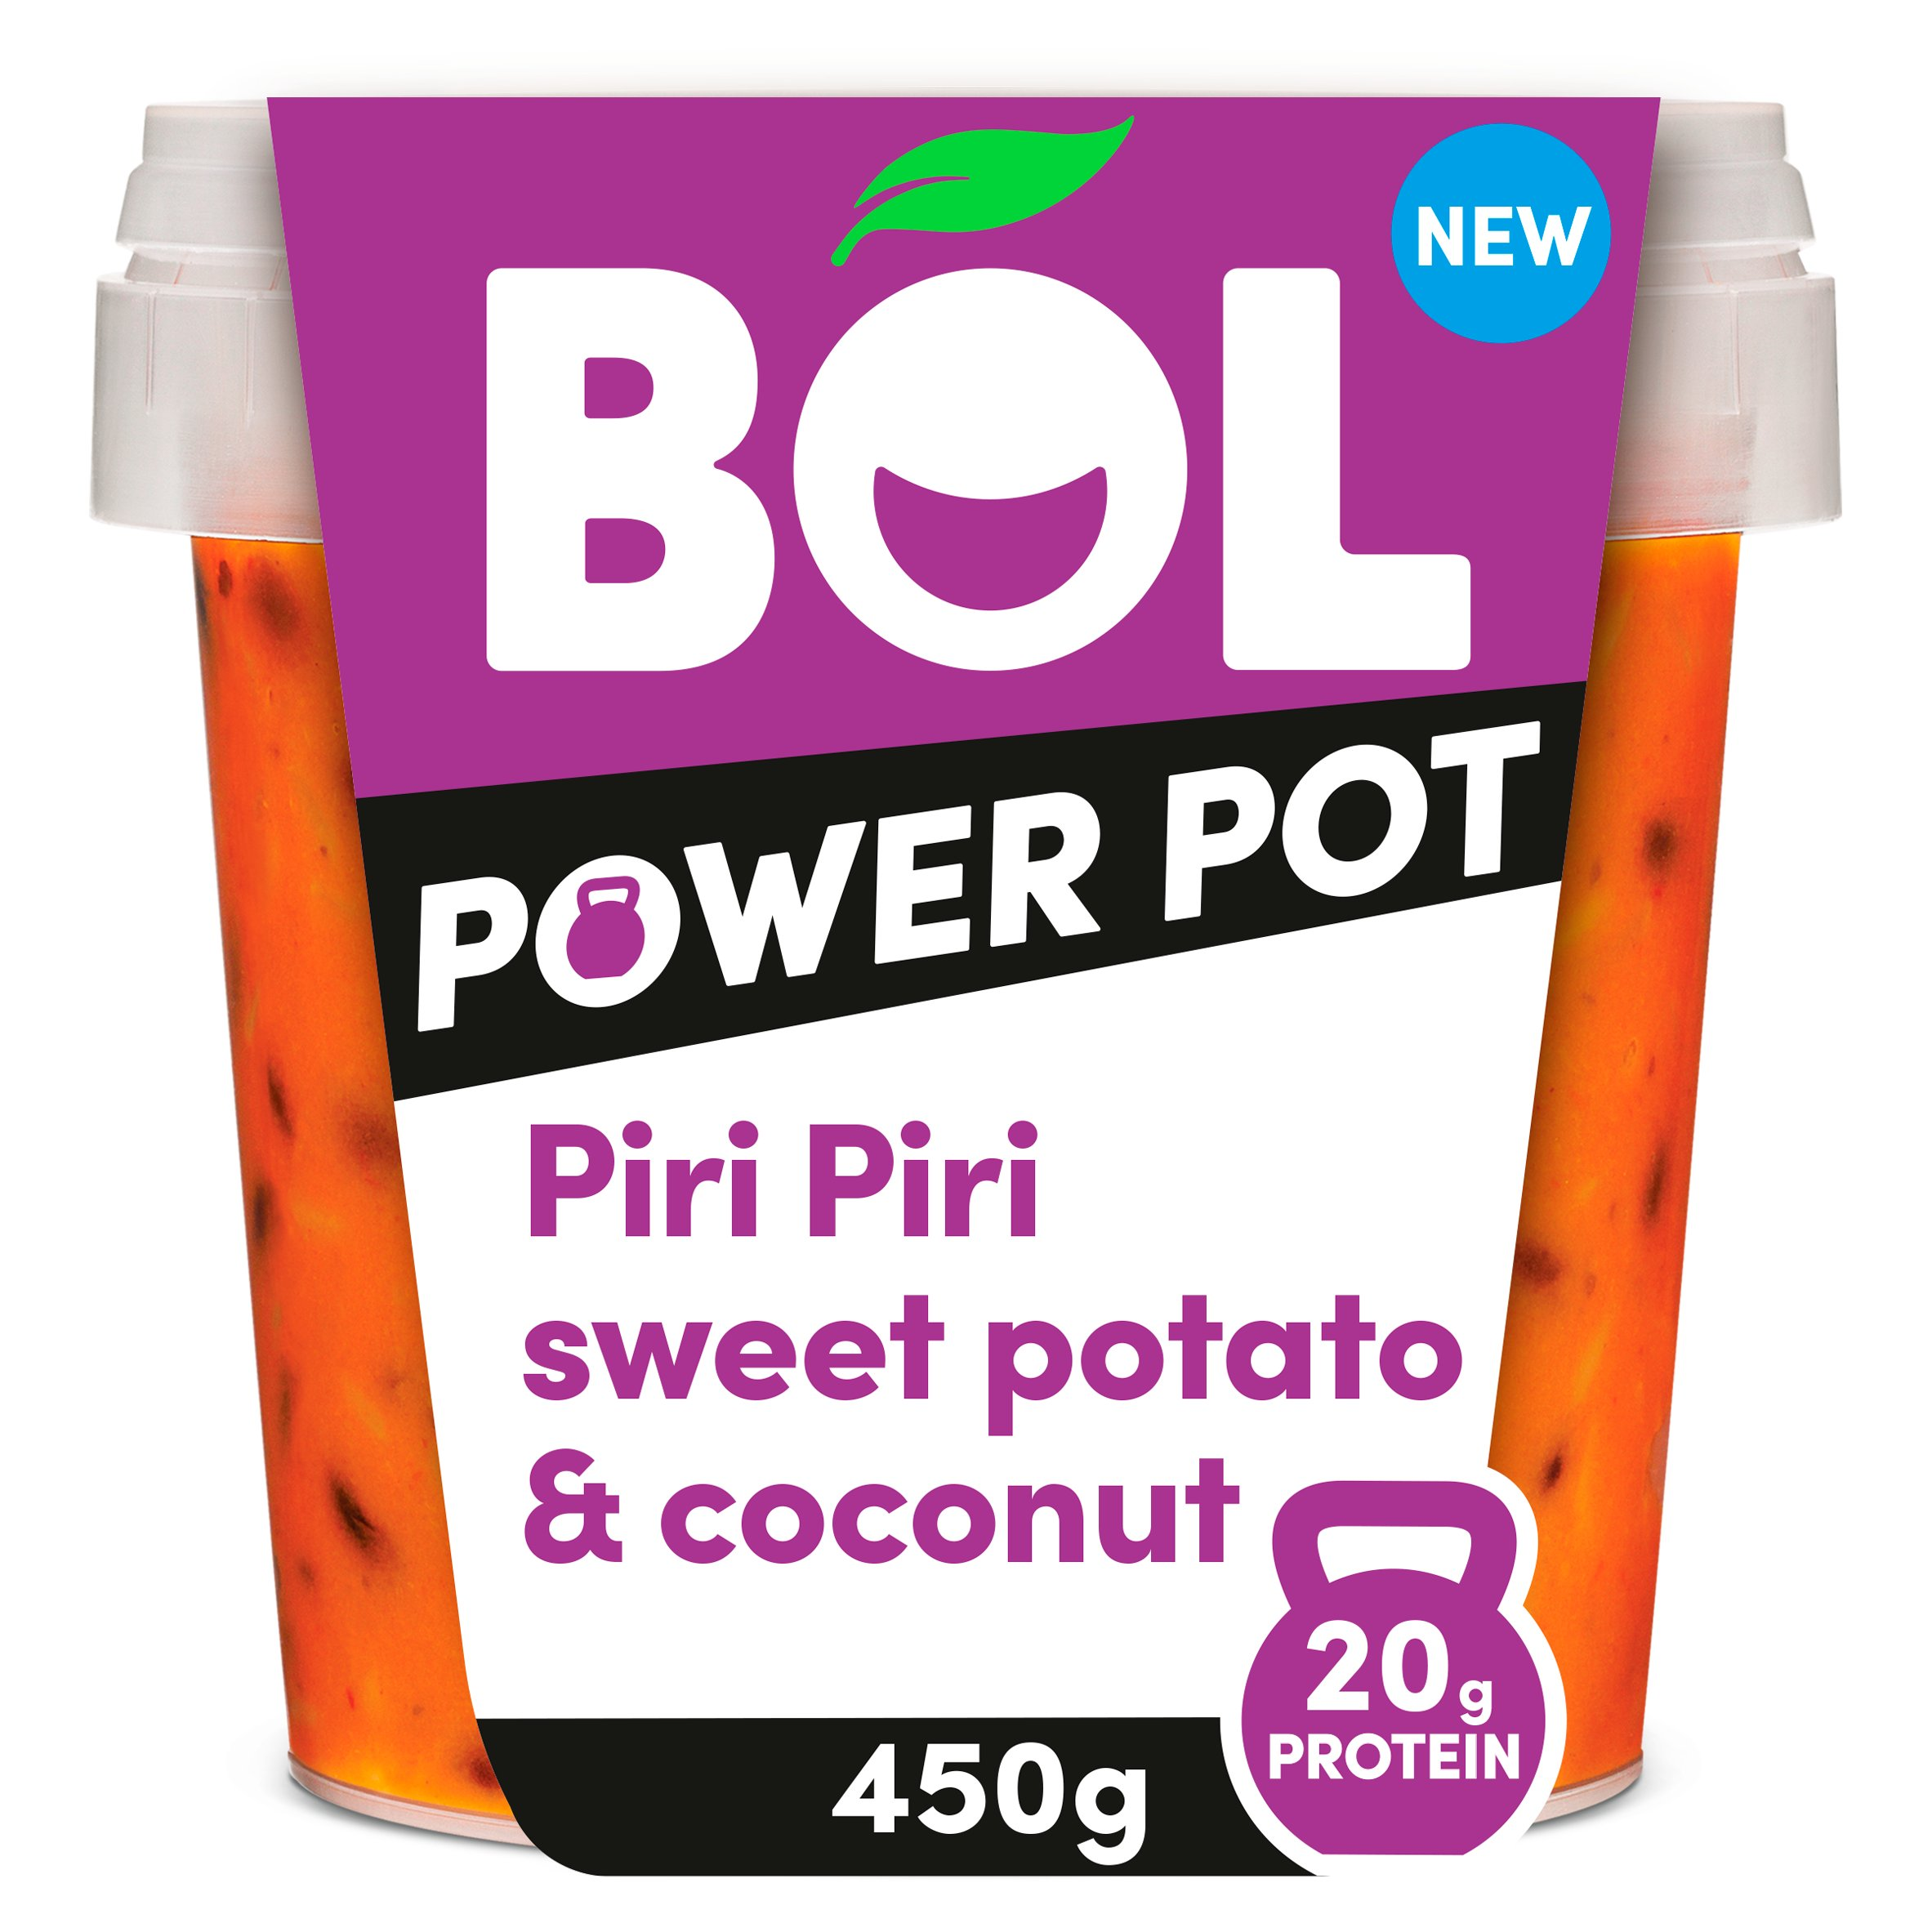 Bol Piri Piri Sweet Potato & Coconut Power Pot 450G